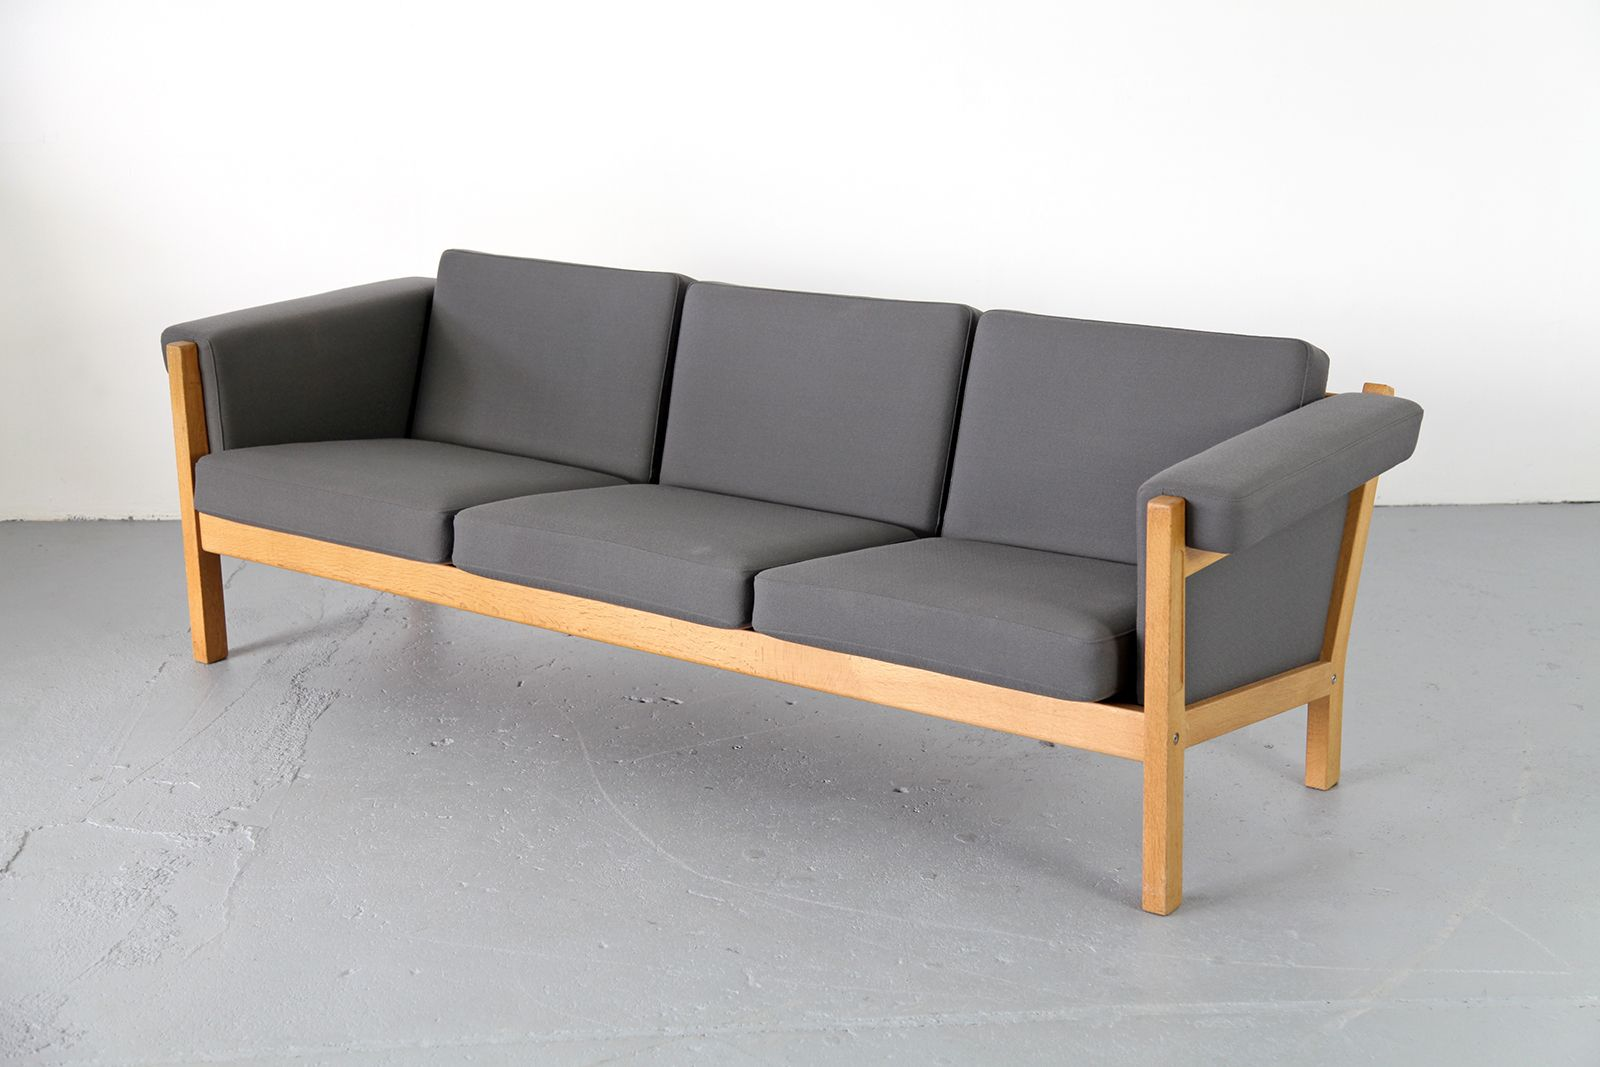 ge 40 three seater sofa by hans j wegner for getama for sale at pamono. Black Bedroom Furniture Sets. Home Design Ideas